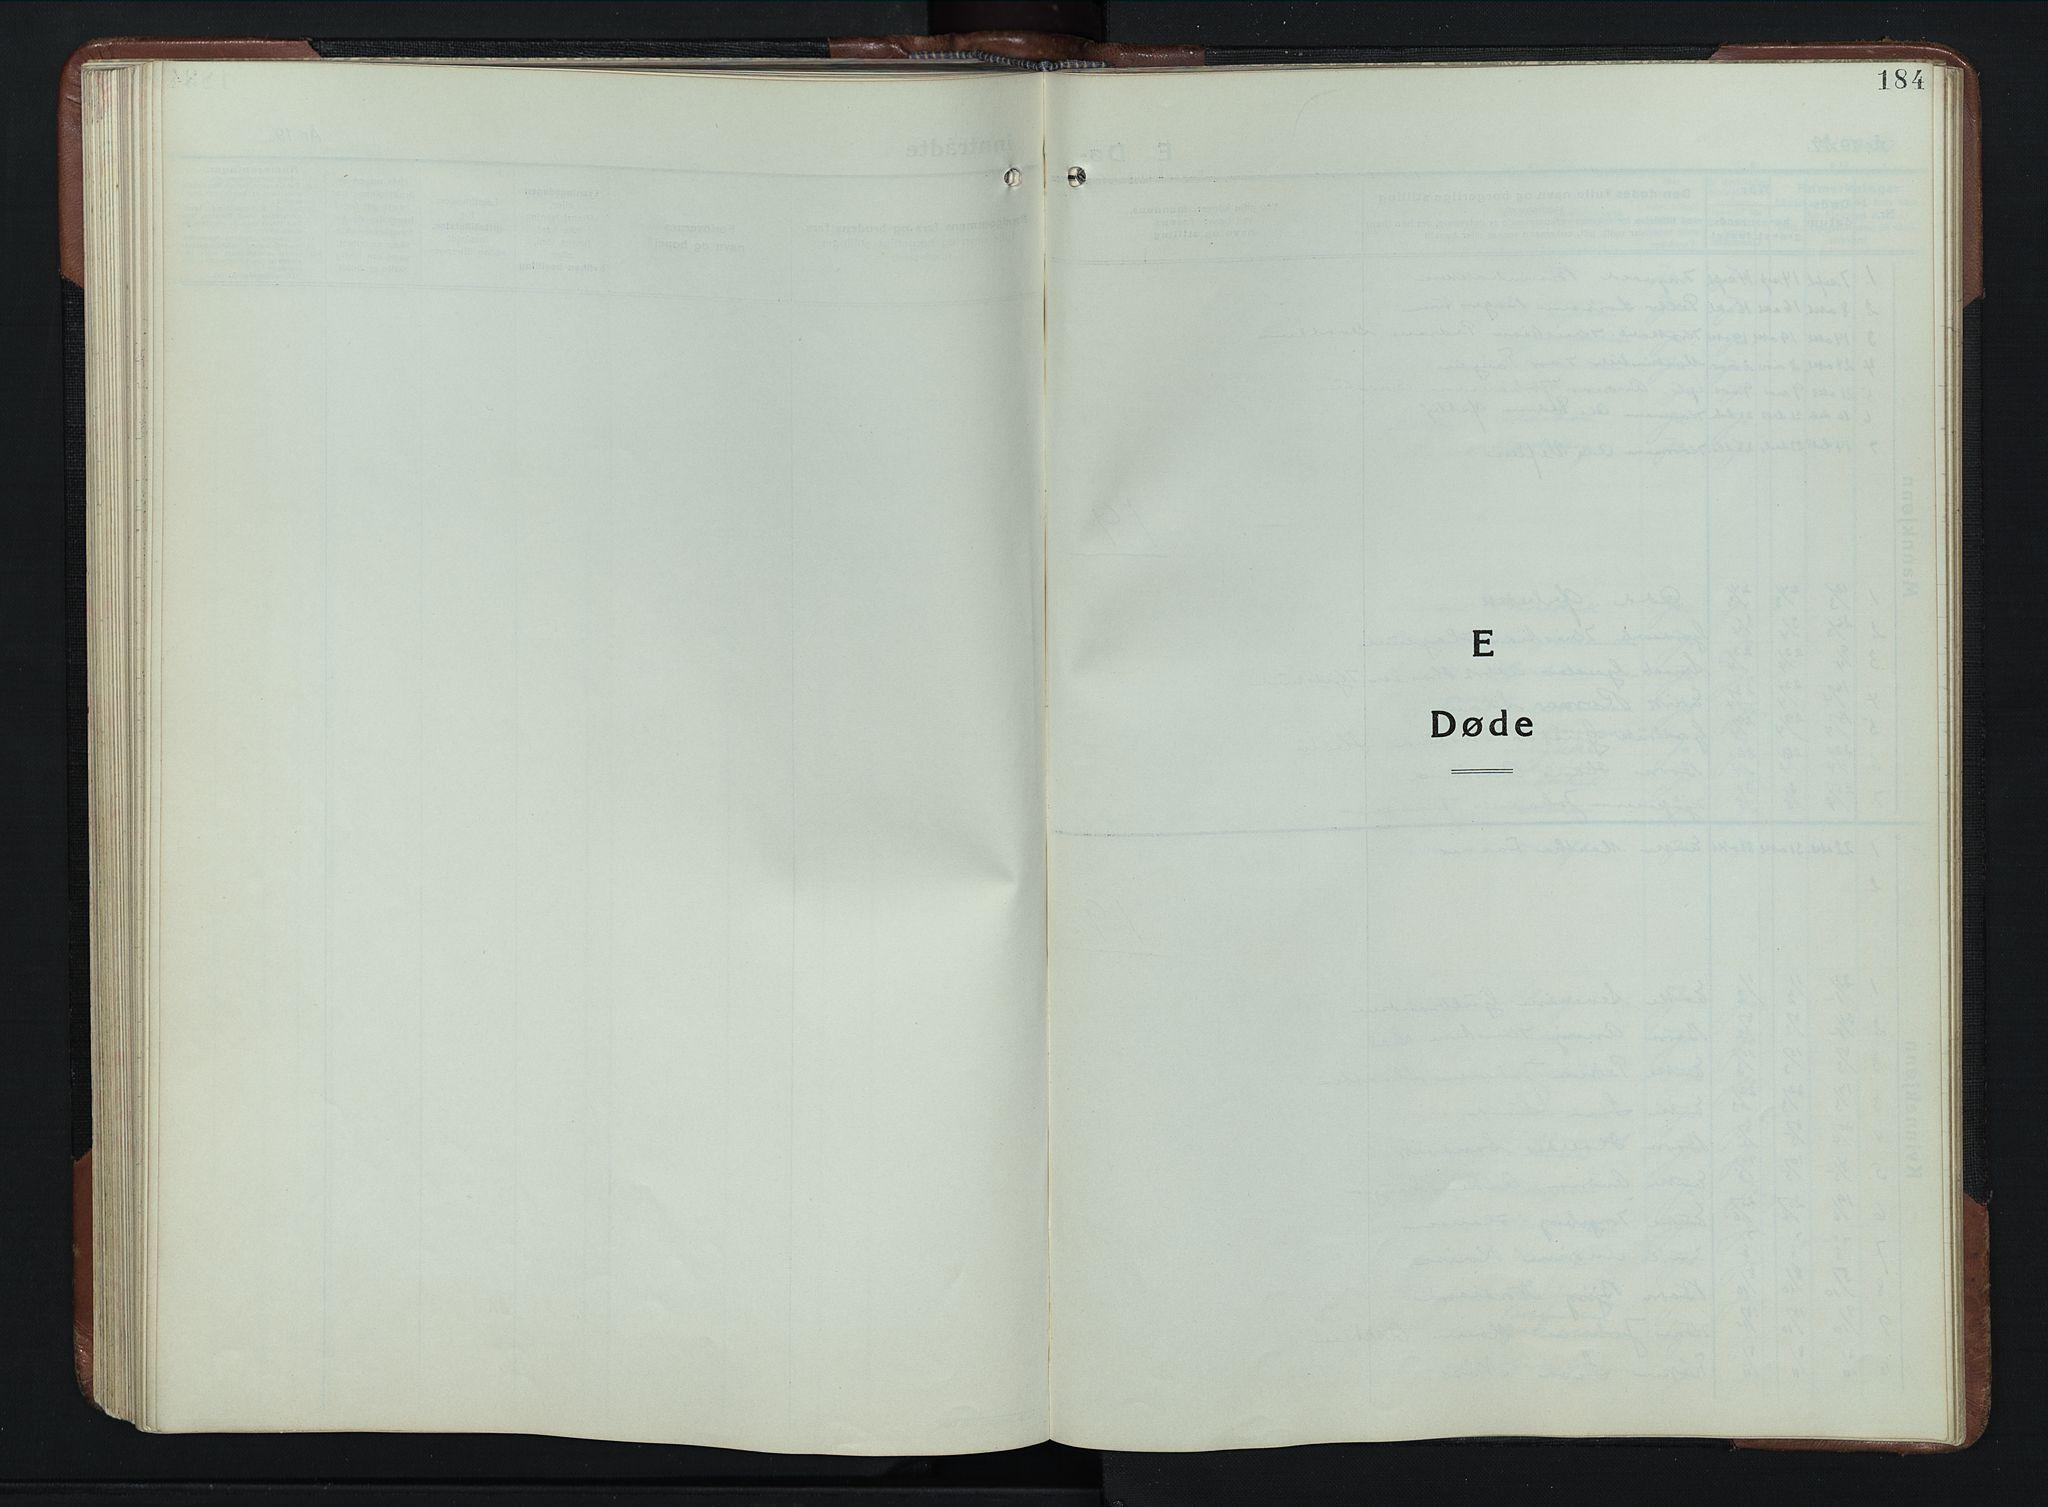 SAH, Vardal prestekontor, H/Ha/Hab/L0023: Klokkerbok nr. 23, 1929-1941, s. 184